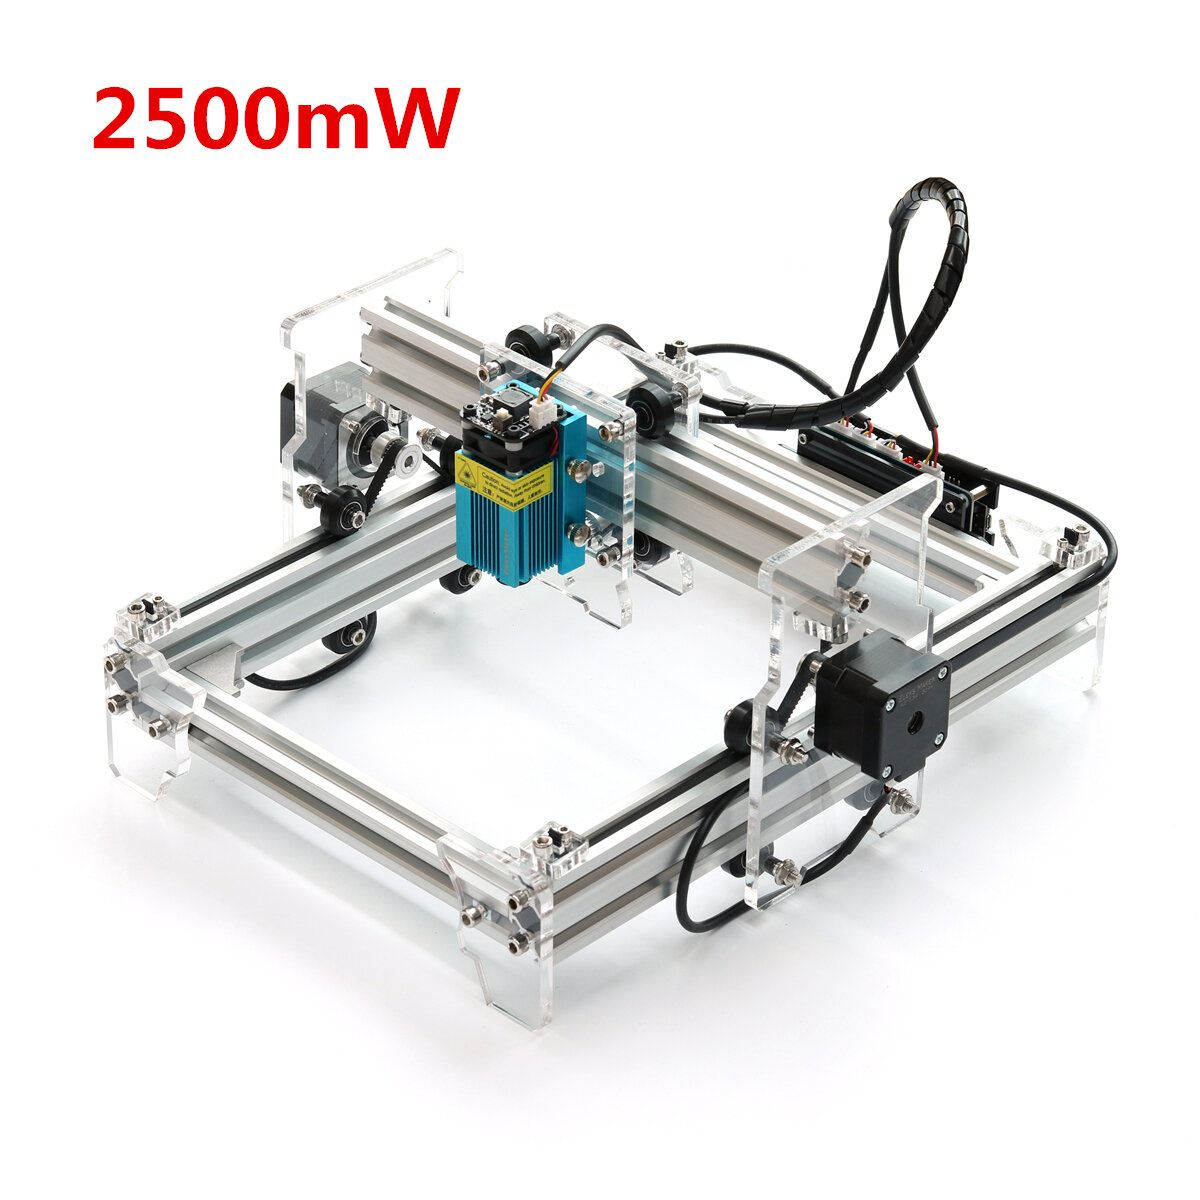 2500mW Desktop DIY Violet Laser Engraver Engraving Machine Picture CNC Printer Assembling Kits